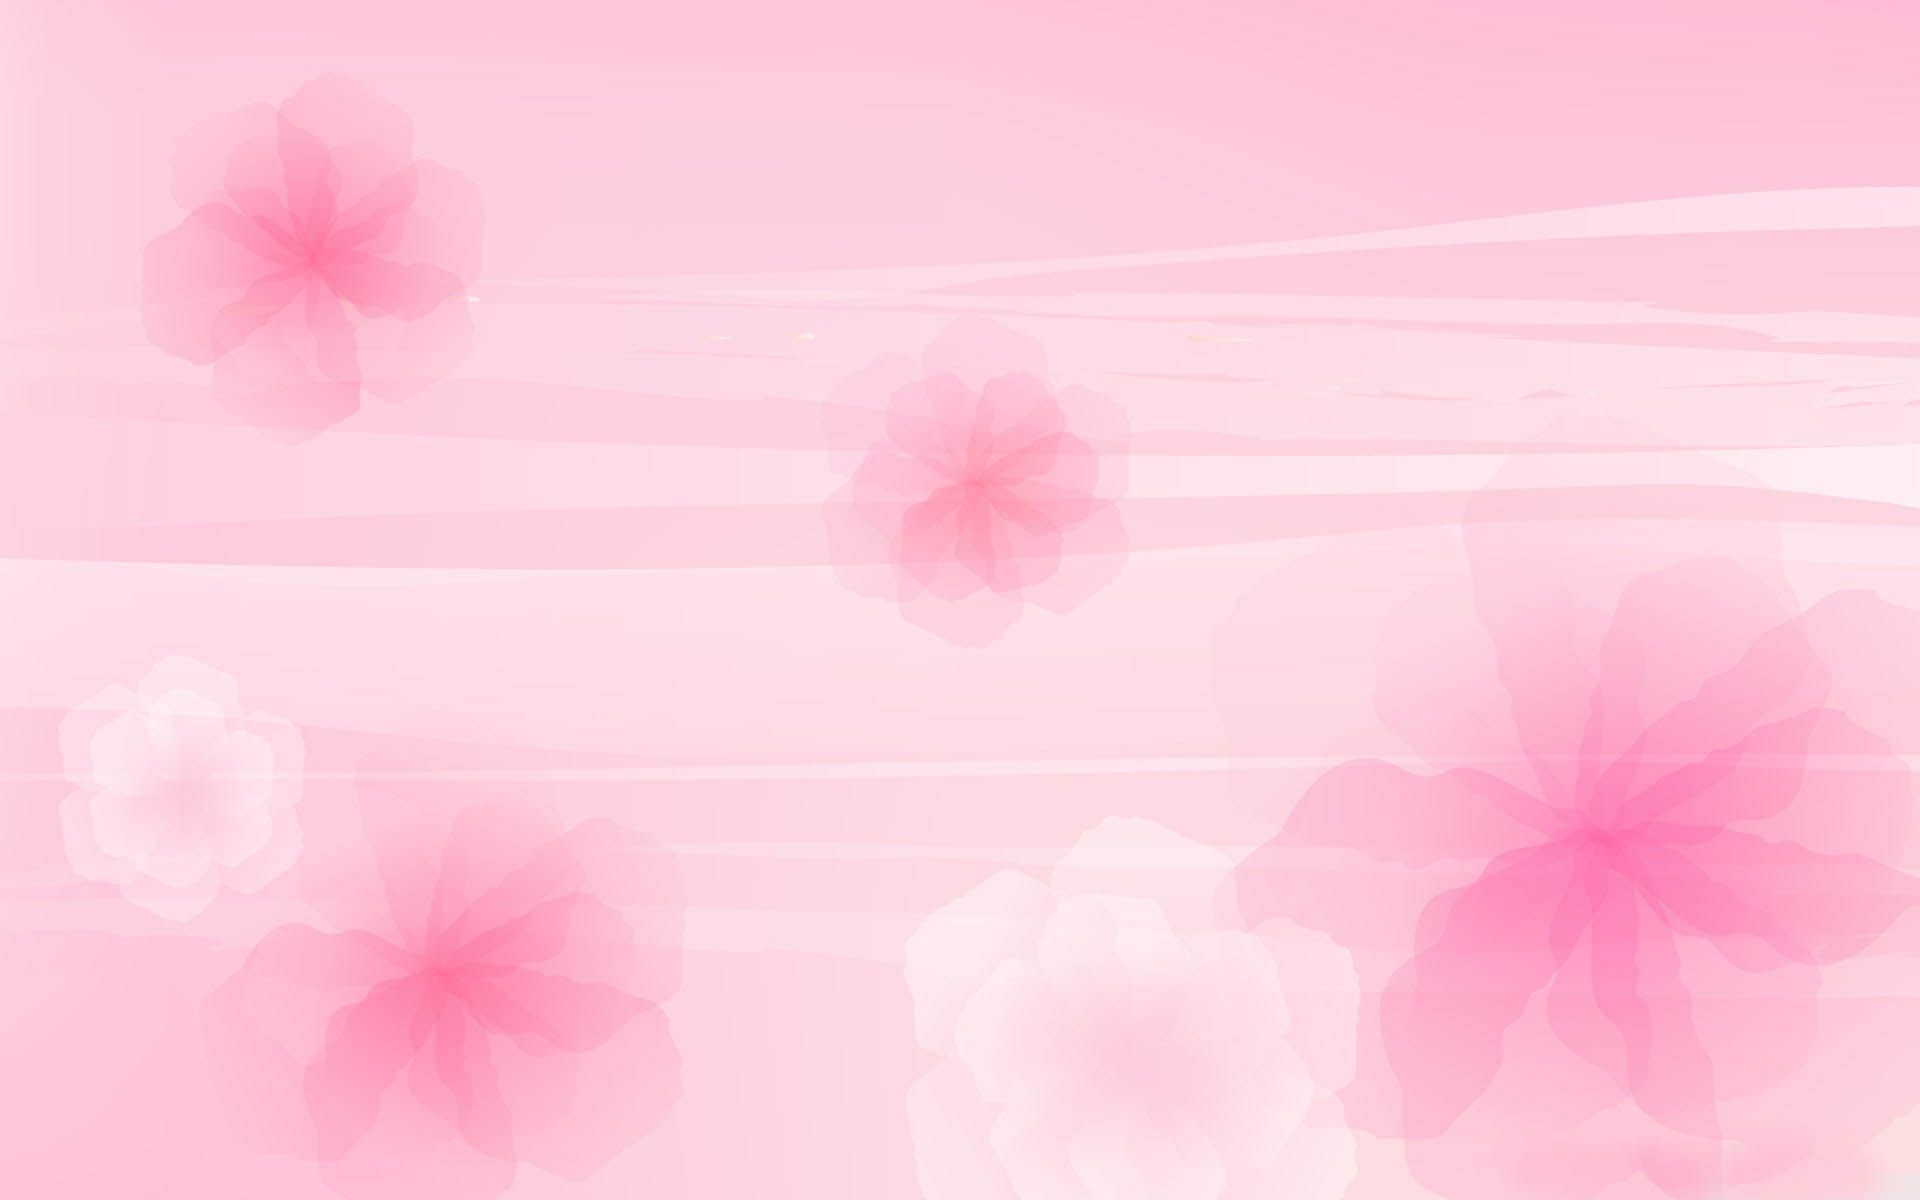 pink backgrounds wallpapers wallpaper wallpapers pinterest